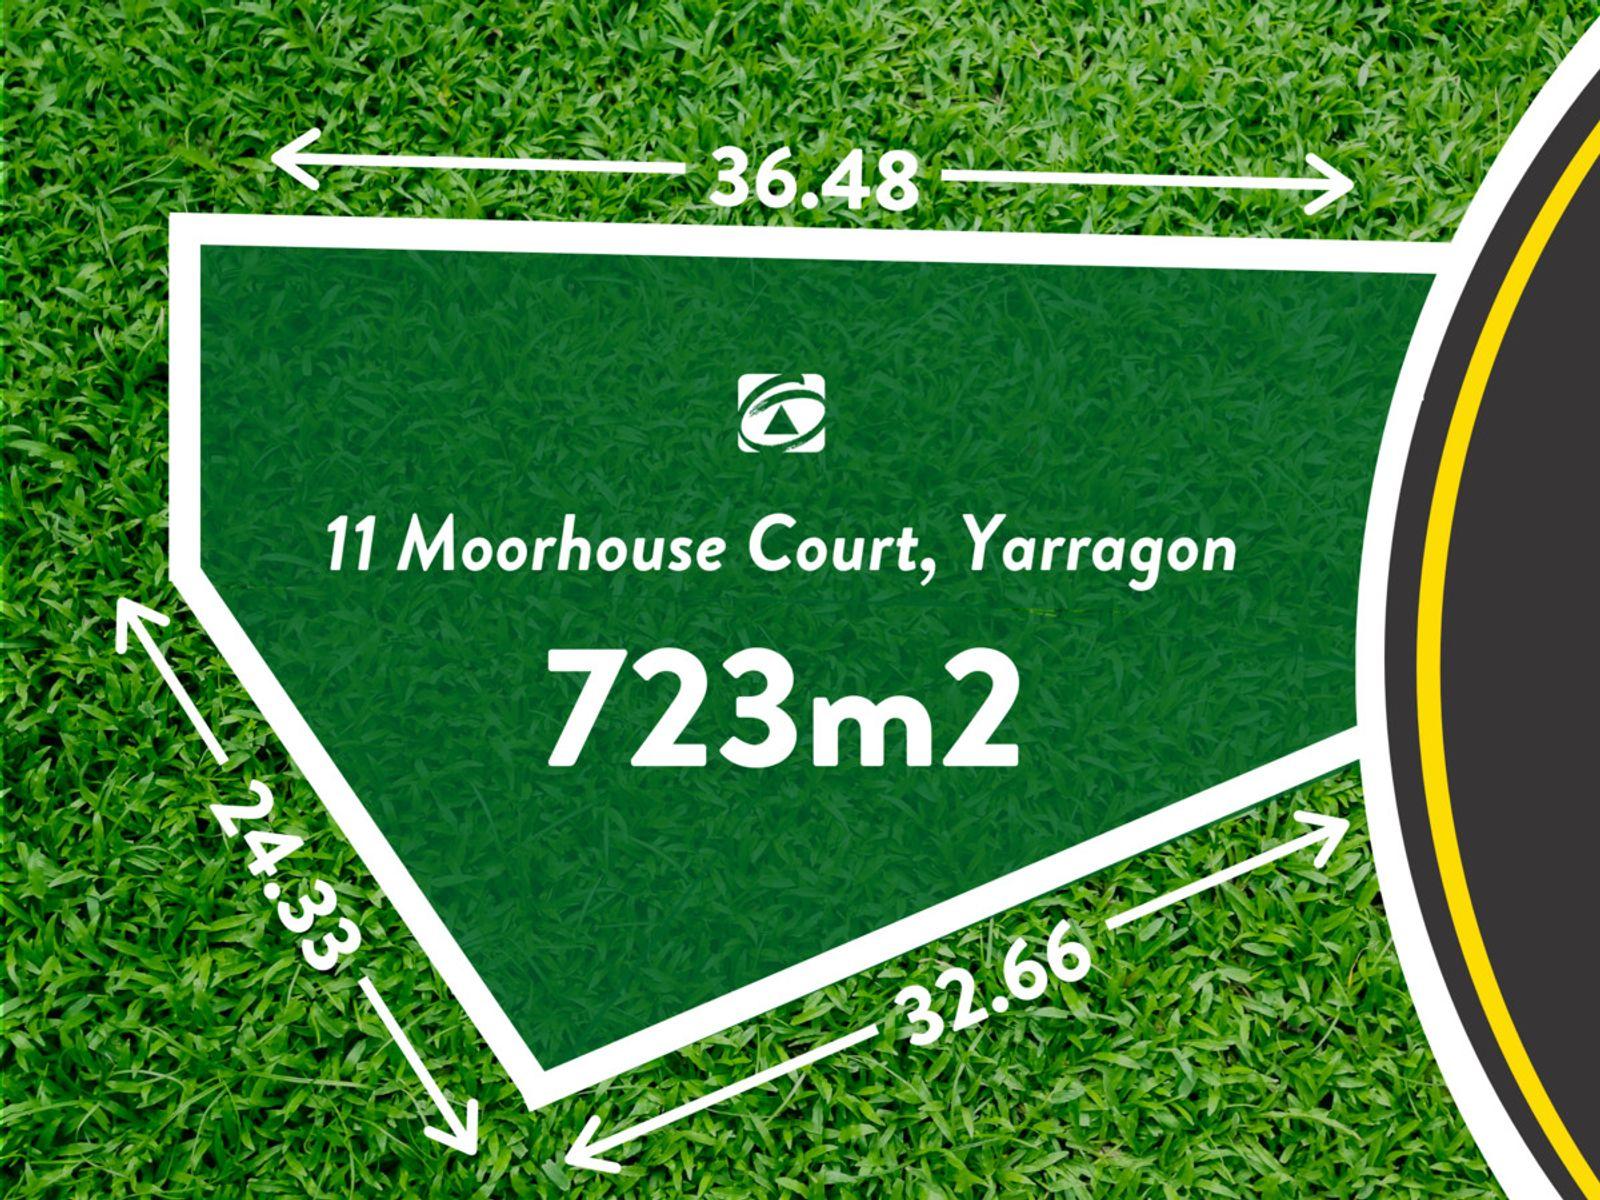 11 Moorhouse Court, Yarragon, VIC 3823